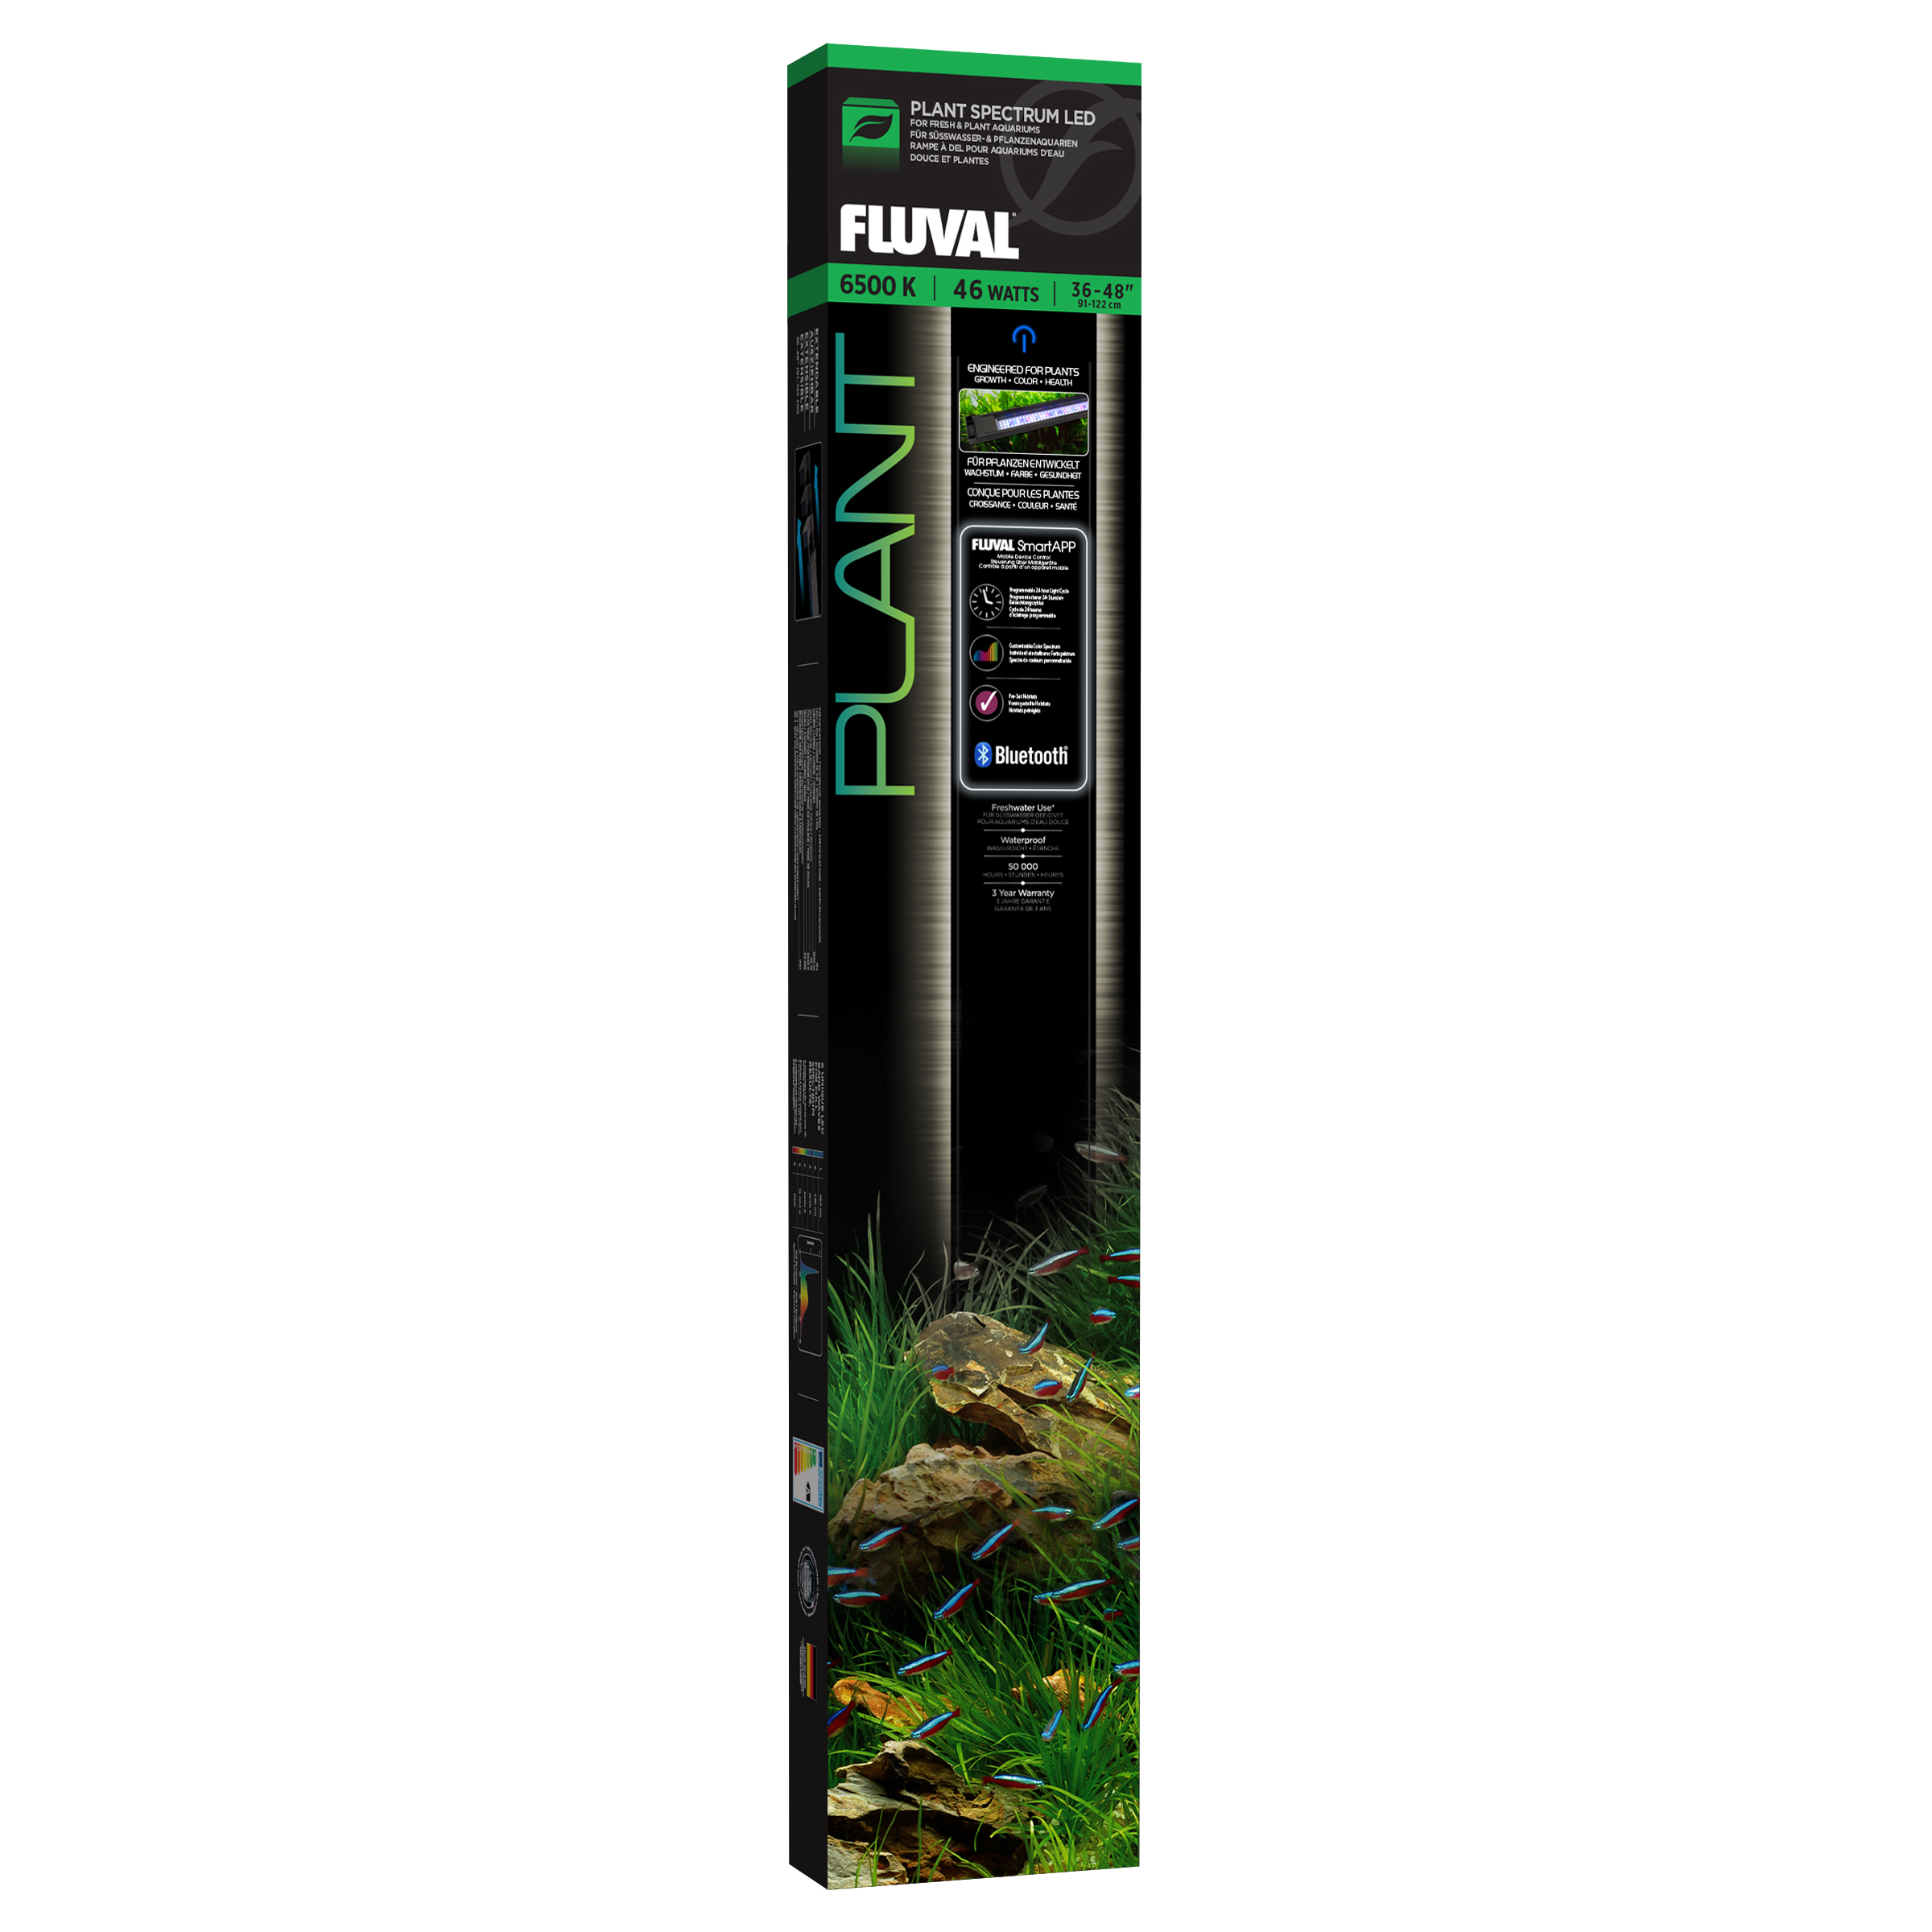 Fluval Plant 3 0 Led Bluetooth Controlled Freshwater